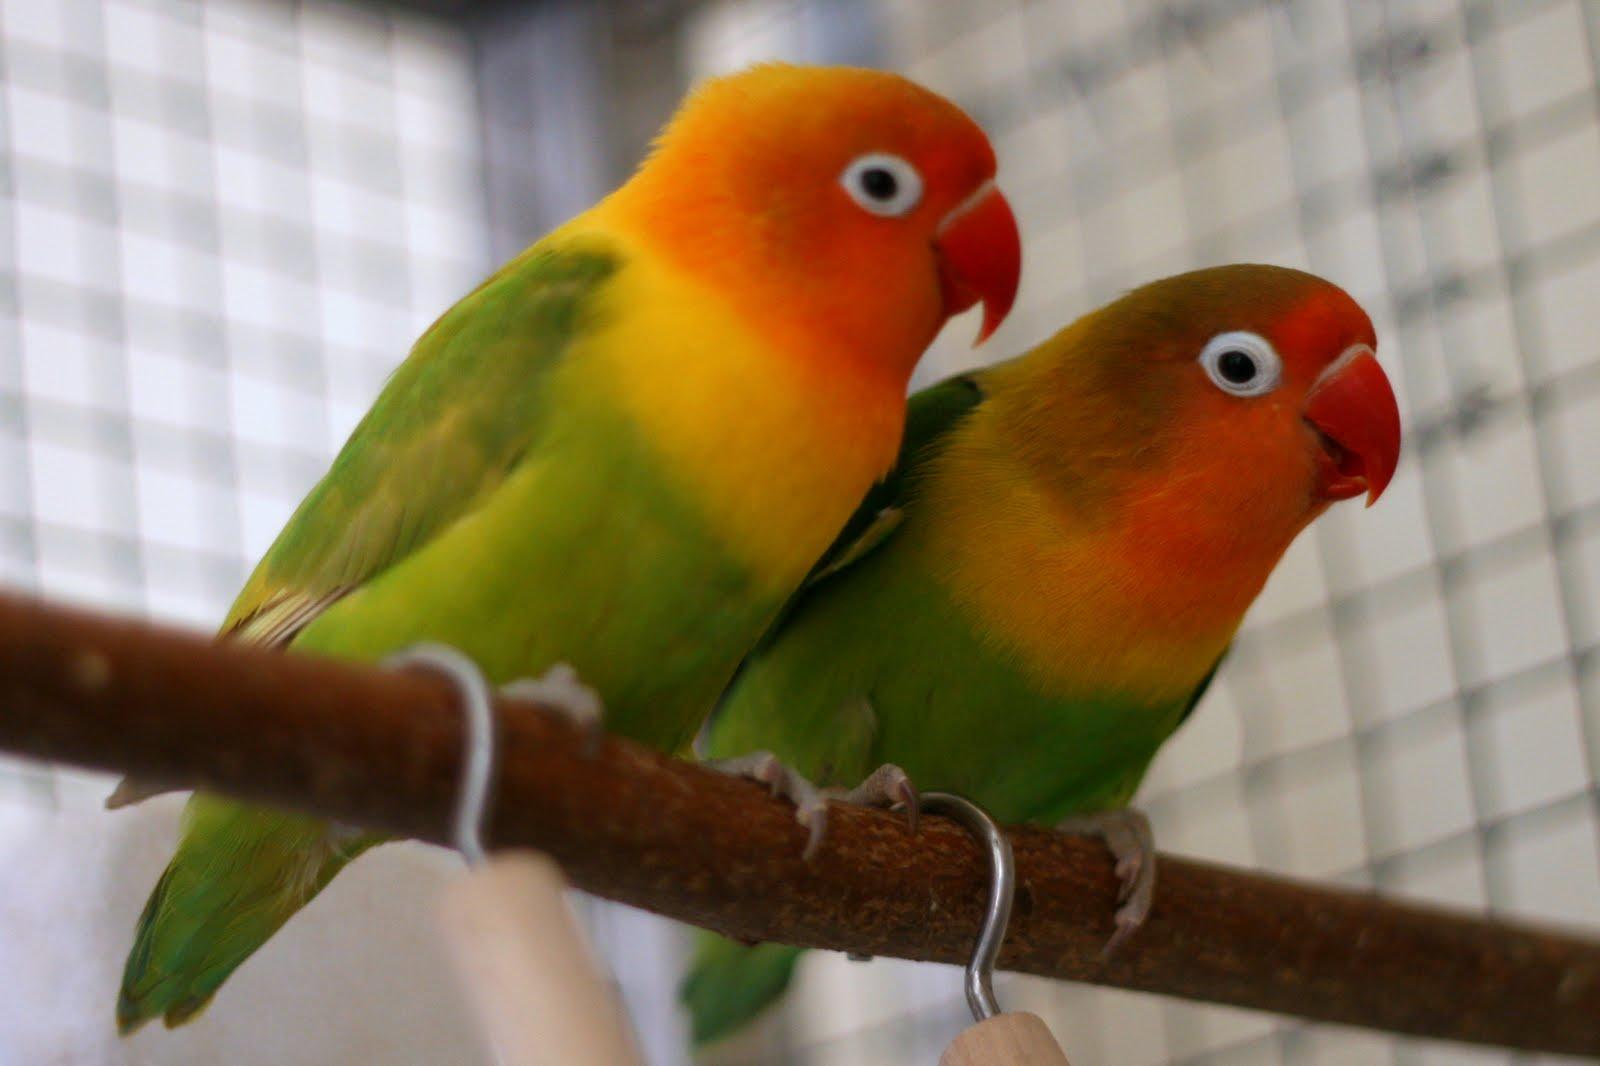 jenis jenis burung lovebird kicau cicicuit